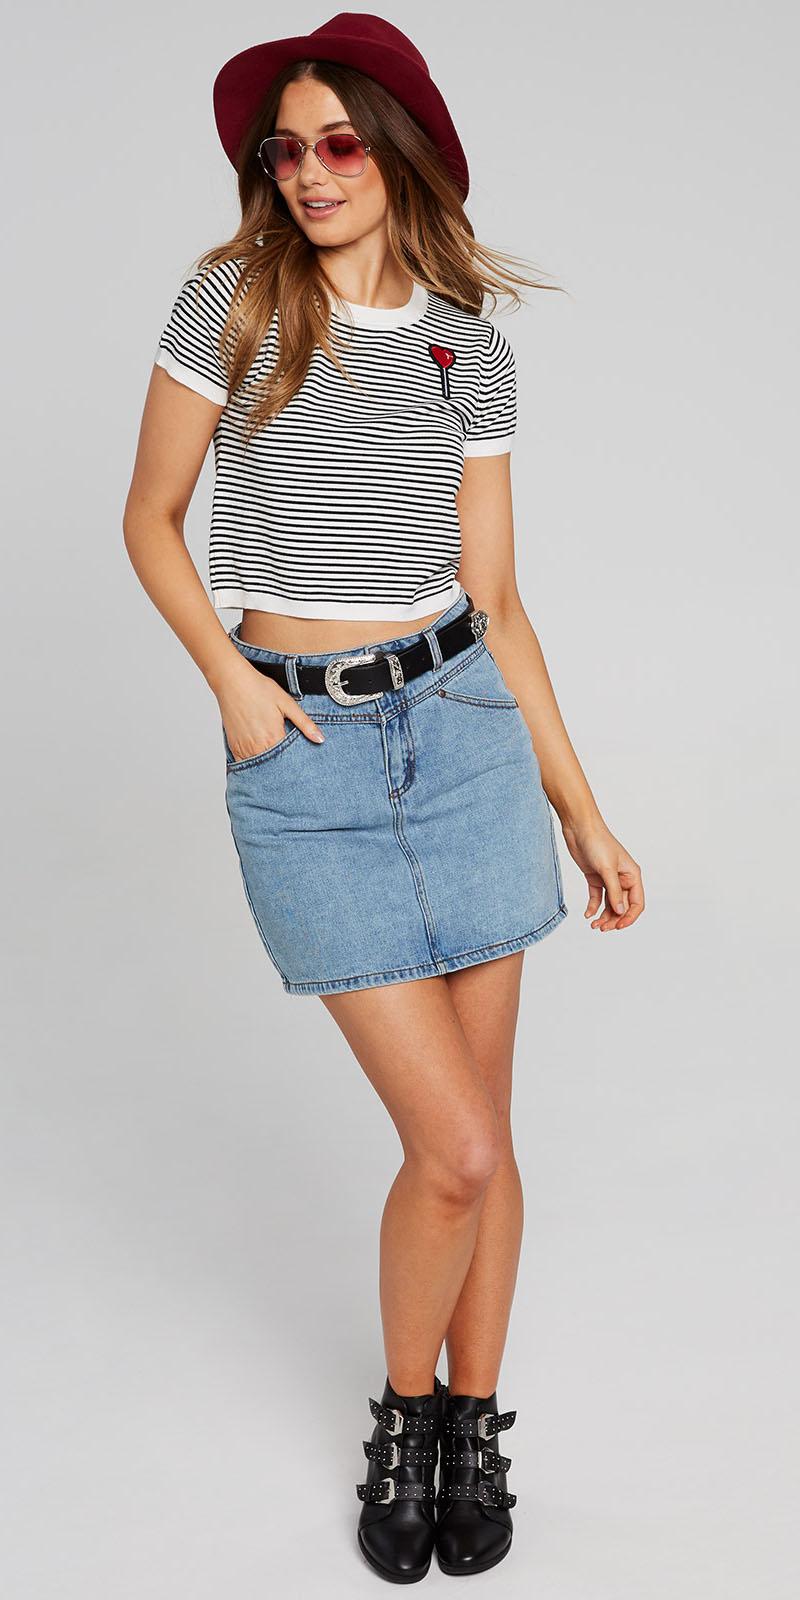 blue-light-mini-skirt-denim-belt-black-tee-stripe-hat-sun-black-shoe-booties-fall-winter-hairr-lunch.jpg